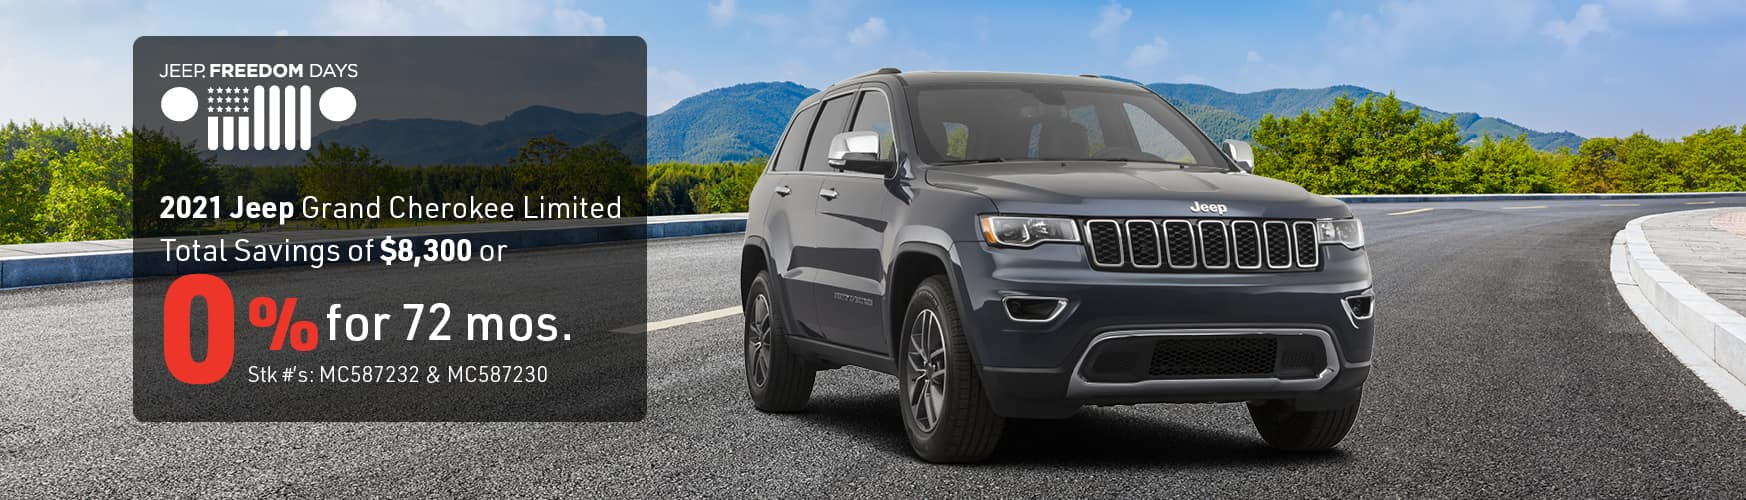 2021 Grand Cherokee Limited